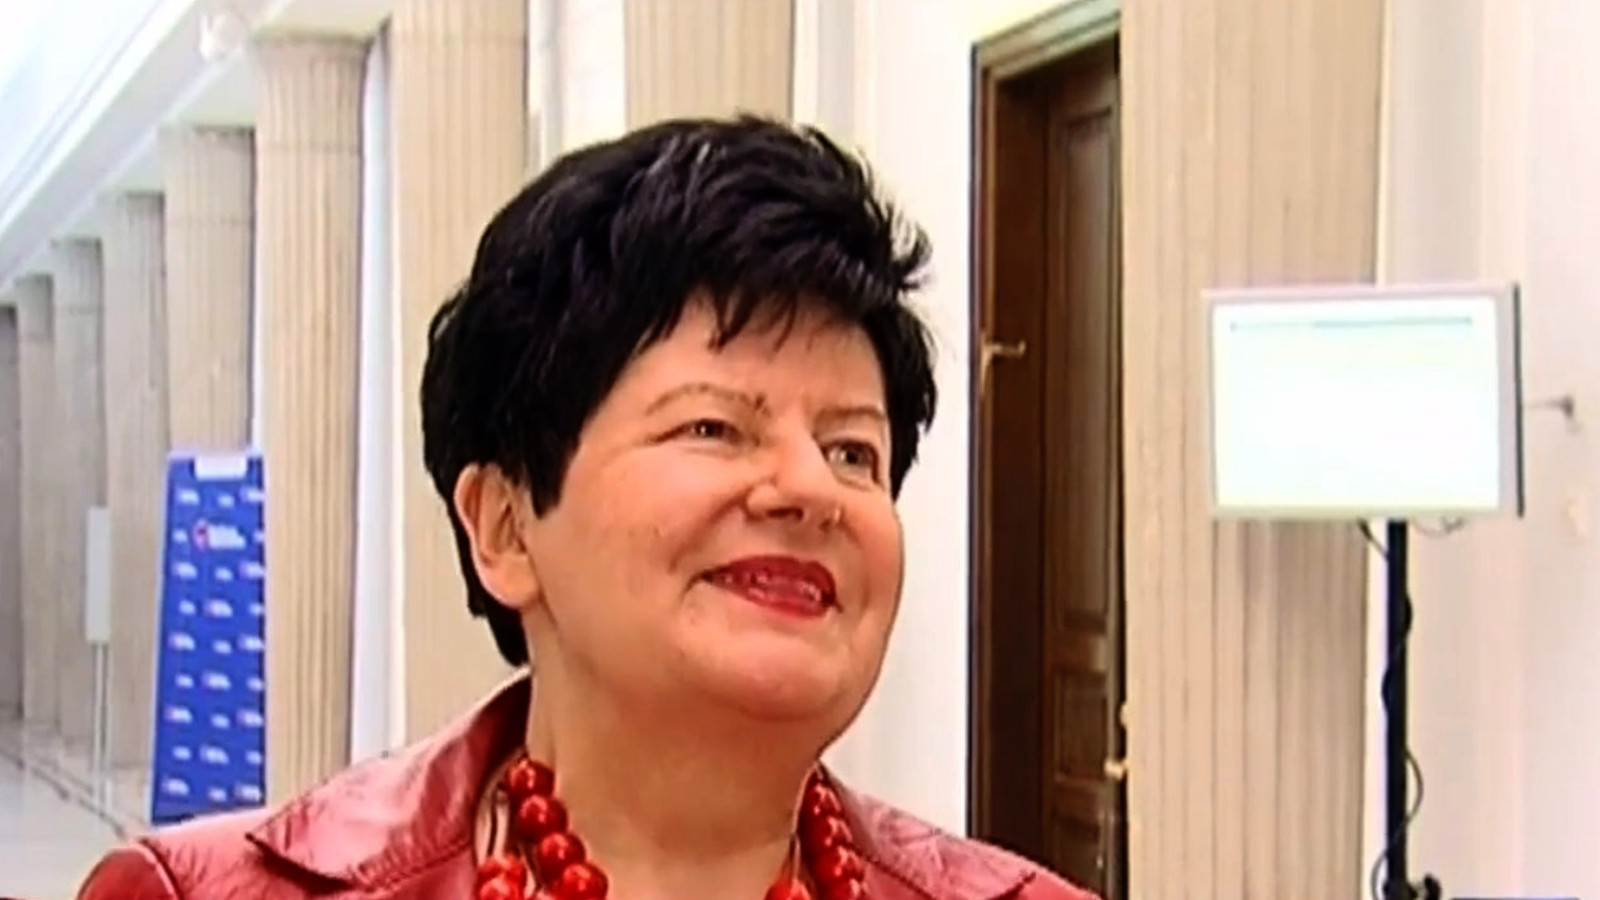 propolski.pl: Incydent z udziałem Joanny Senyszyn